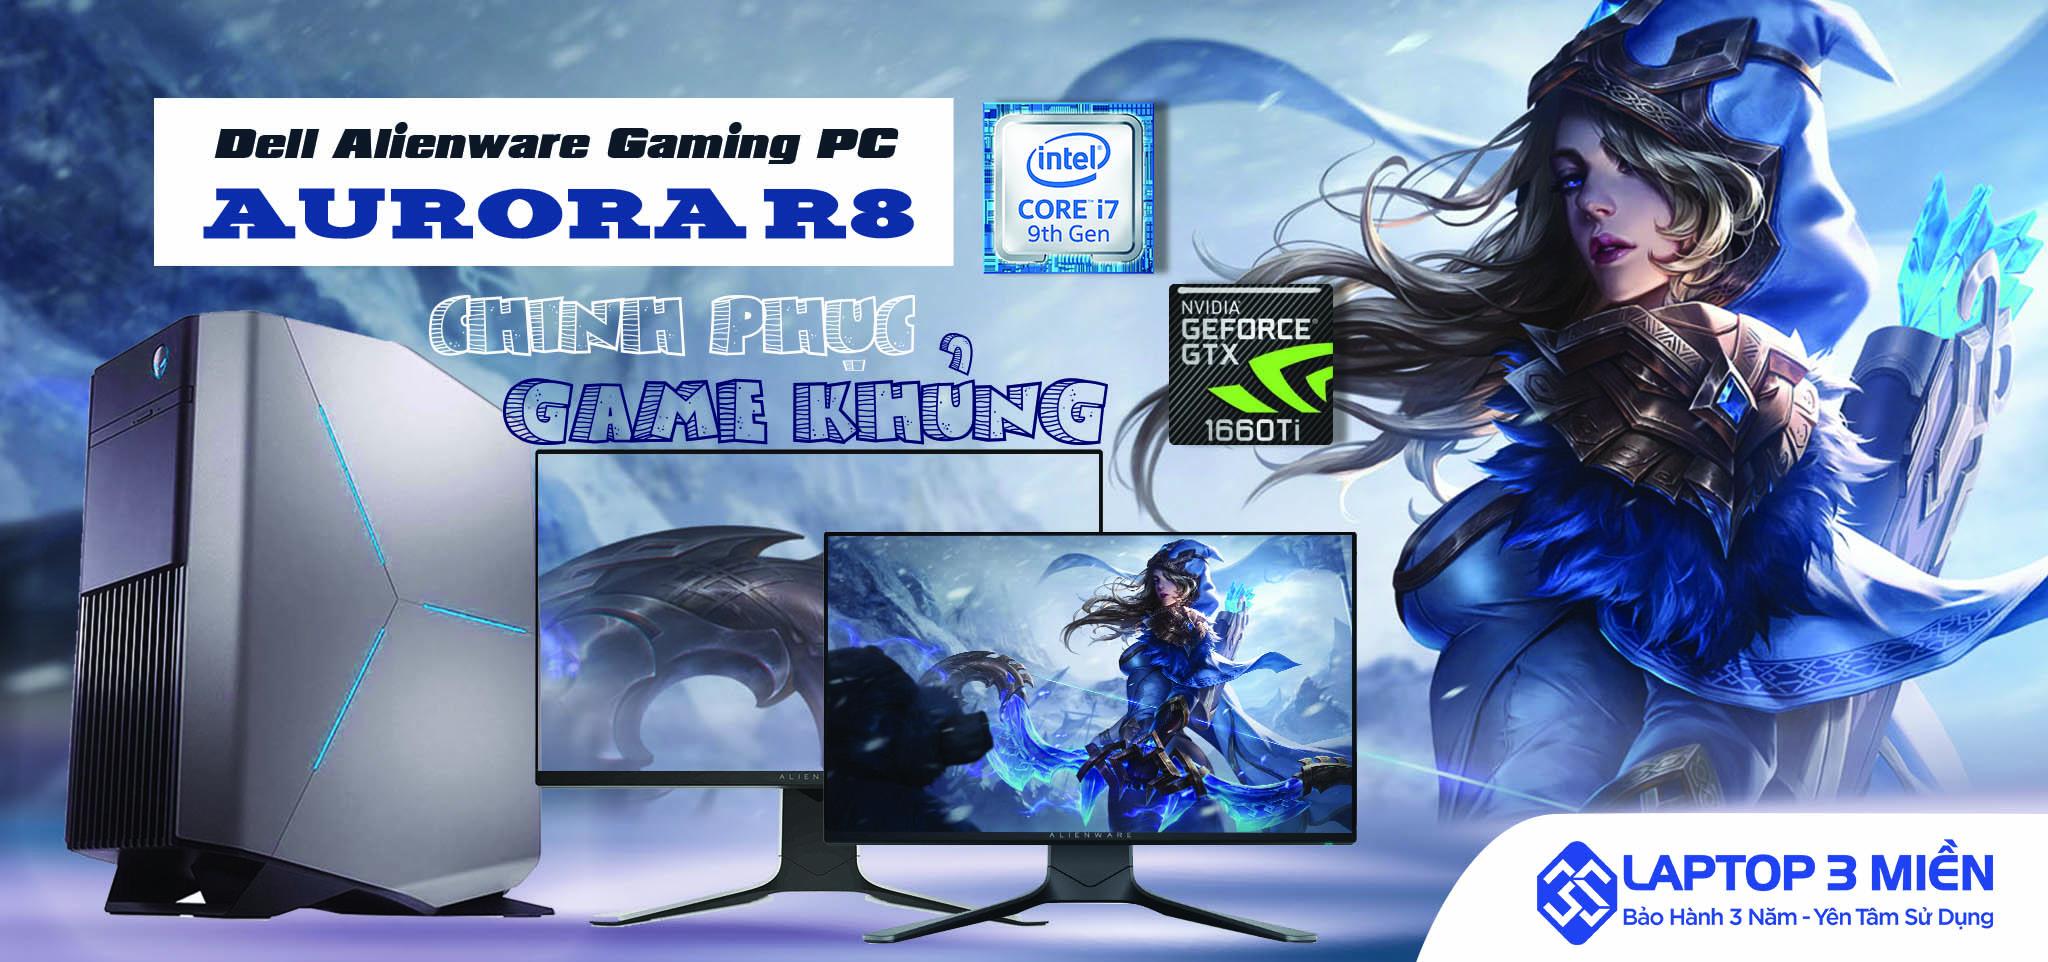 Dell Alienware Gaming PC Aurora R8 - Lối vào hoàn hảo để chơi game cao cấp